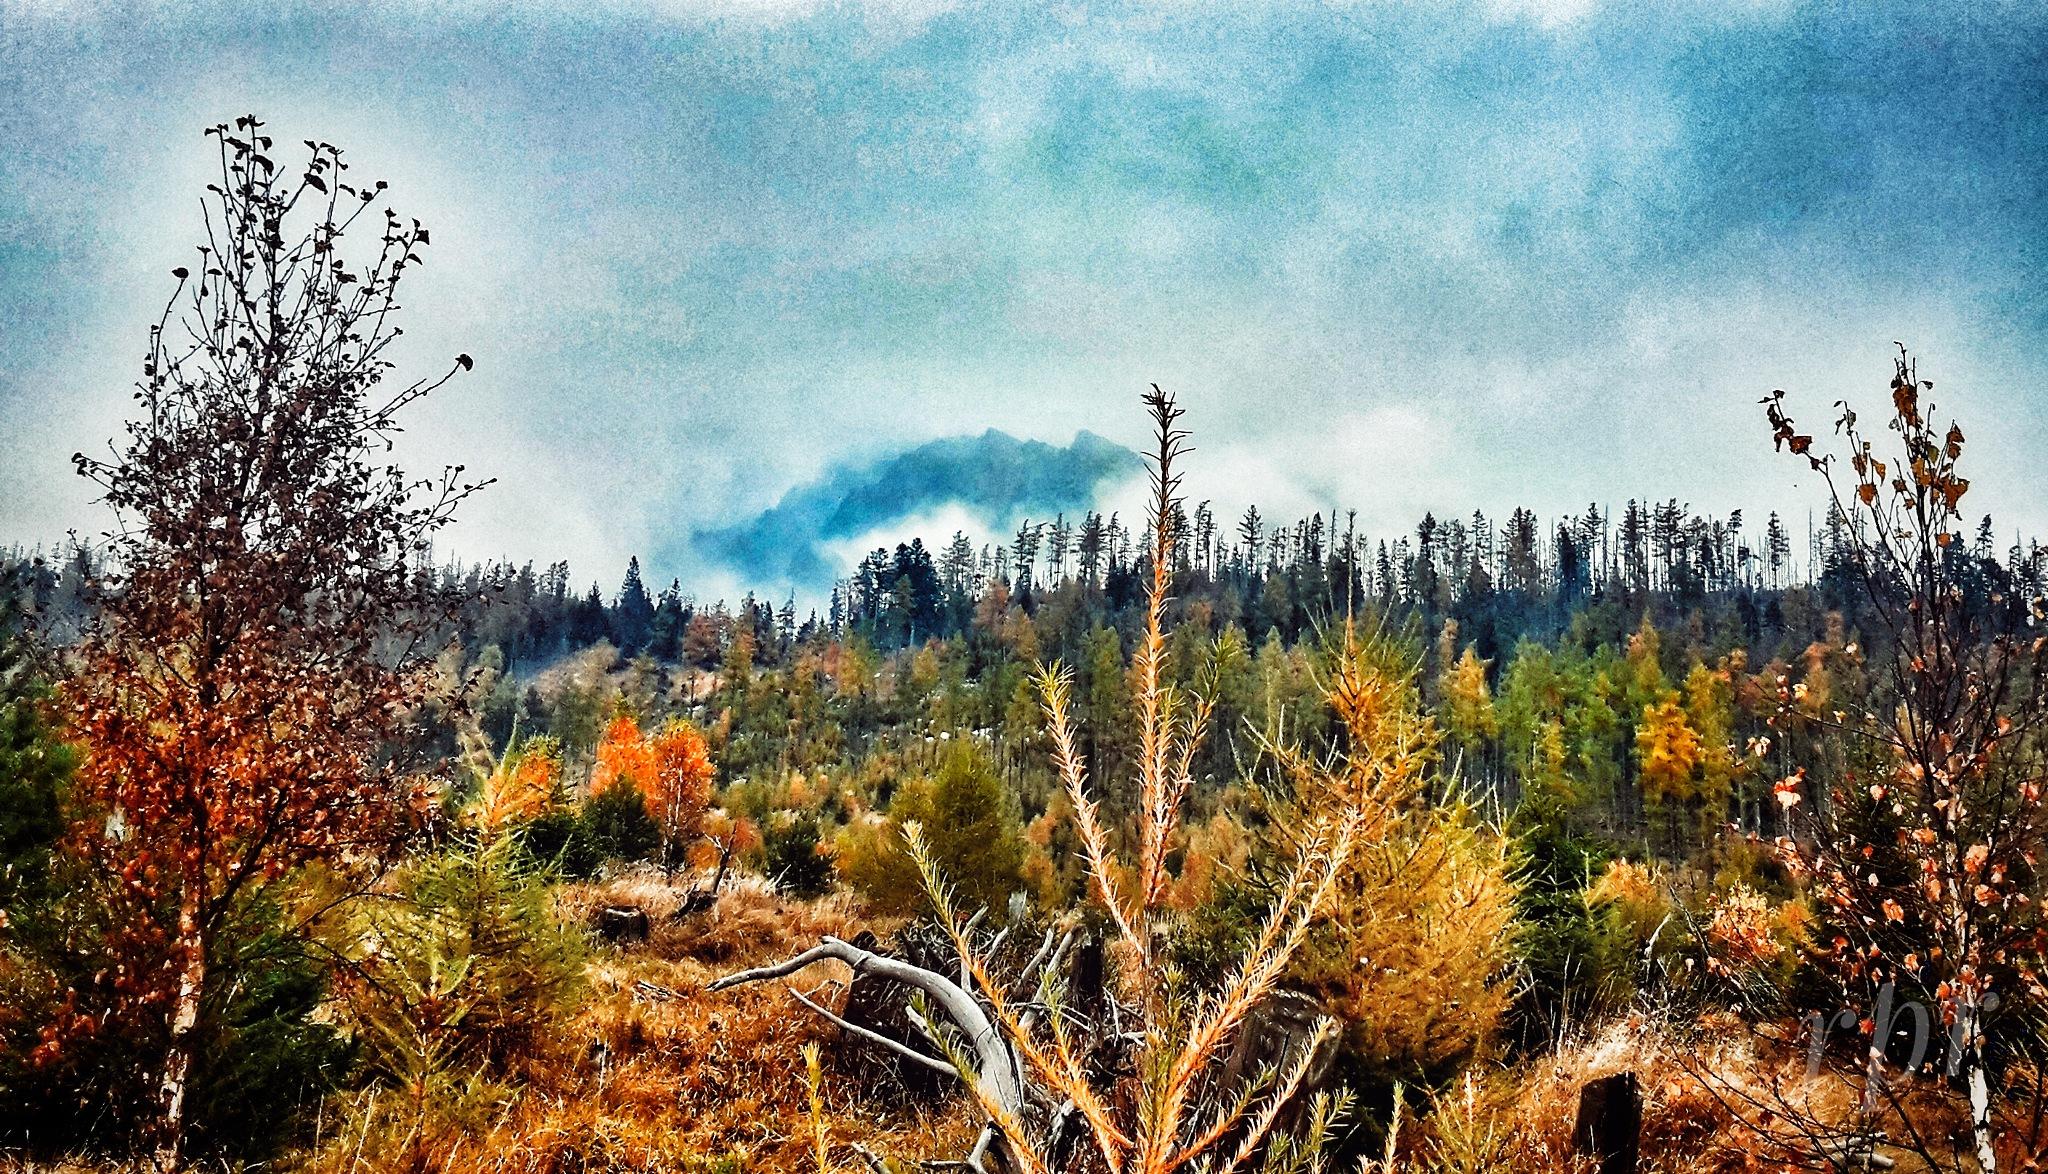 Autumn 2☺ by  robert pojedinec robert